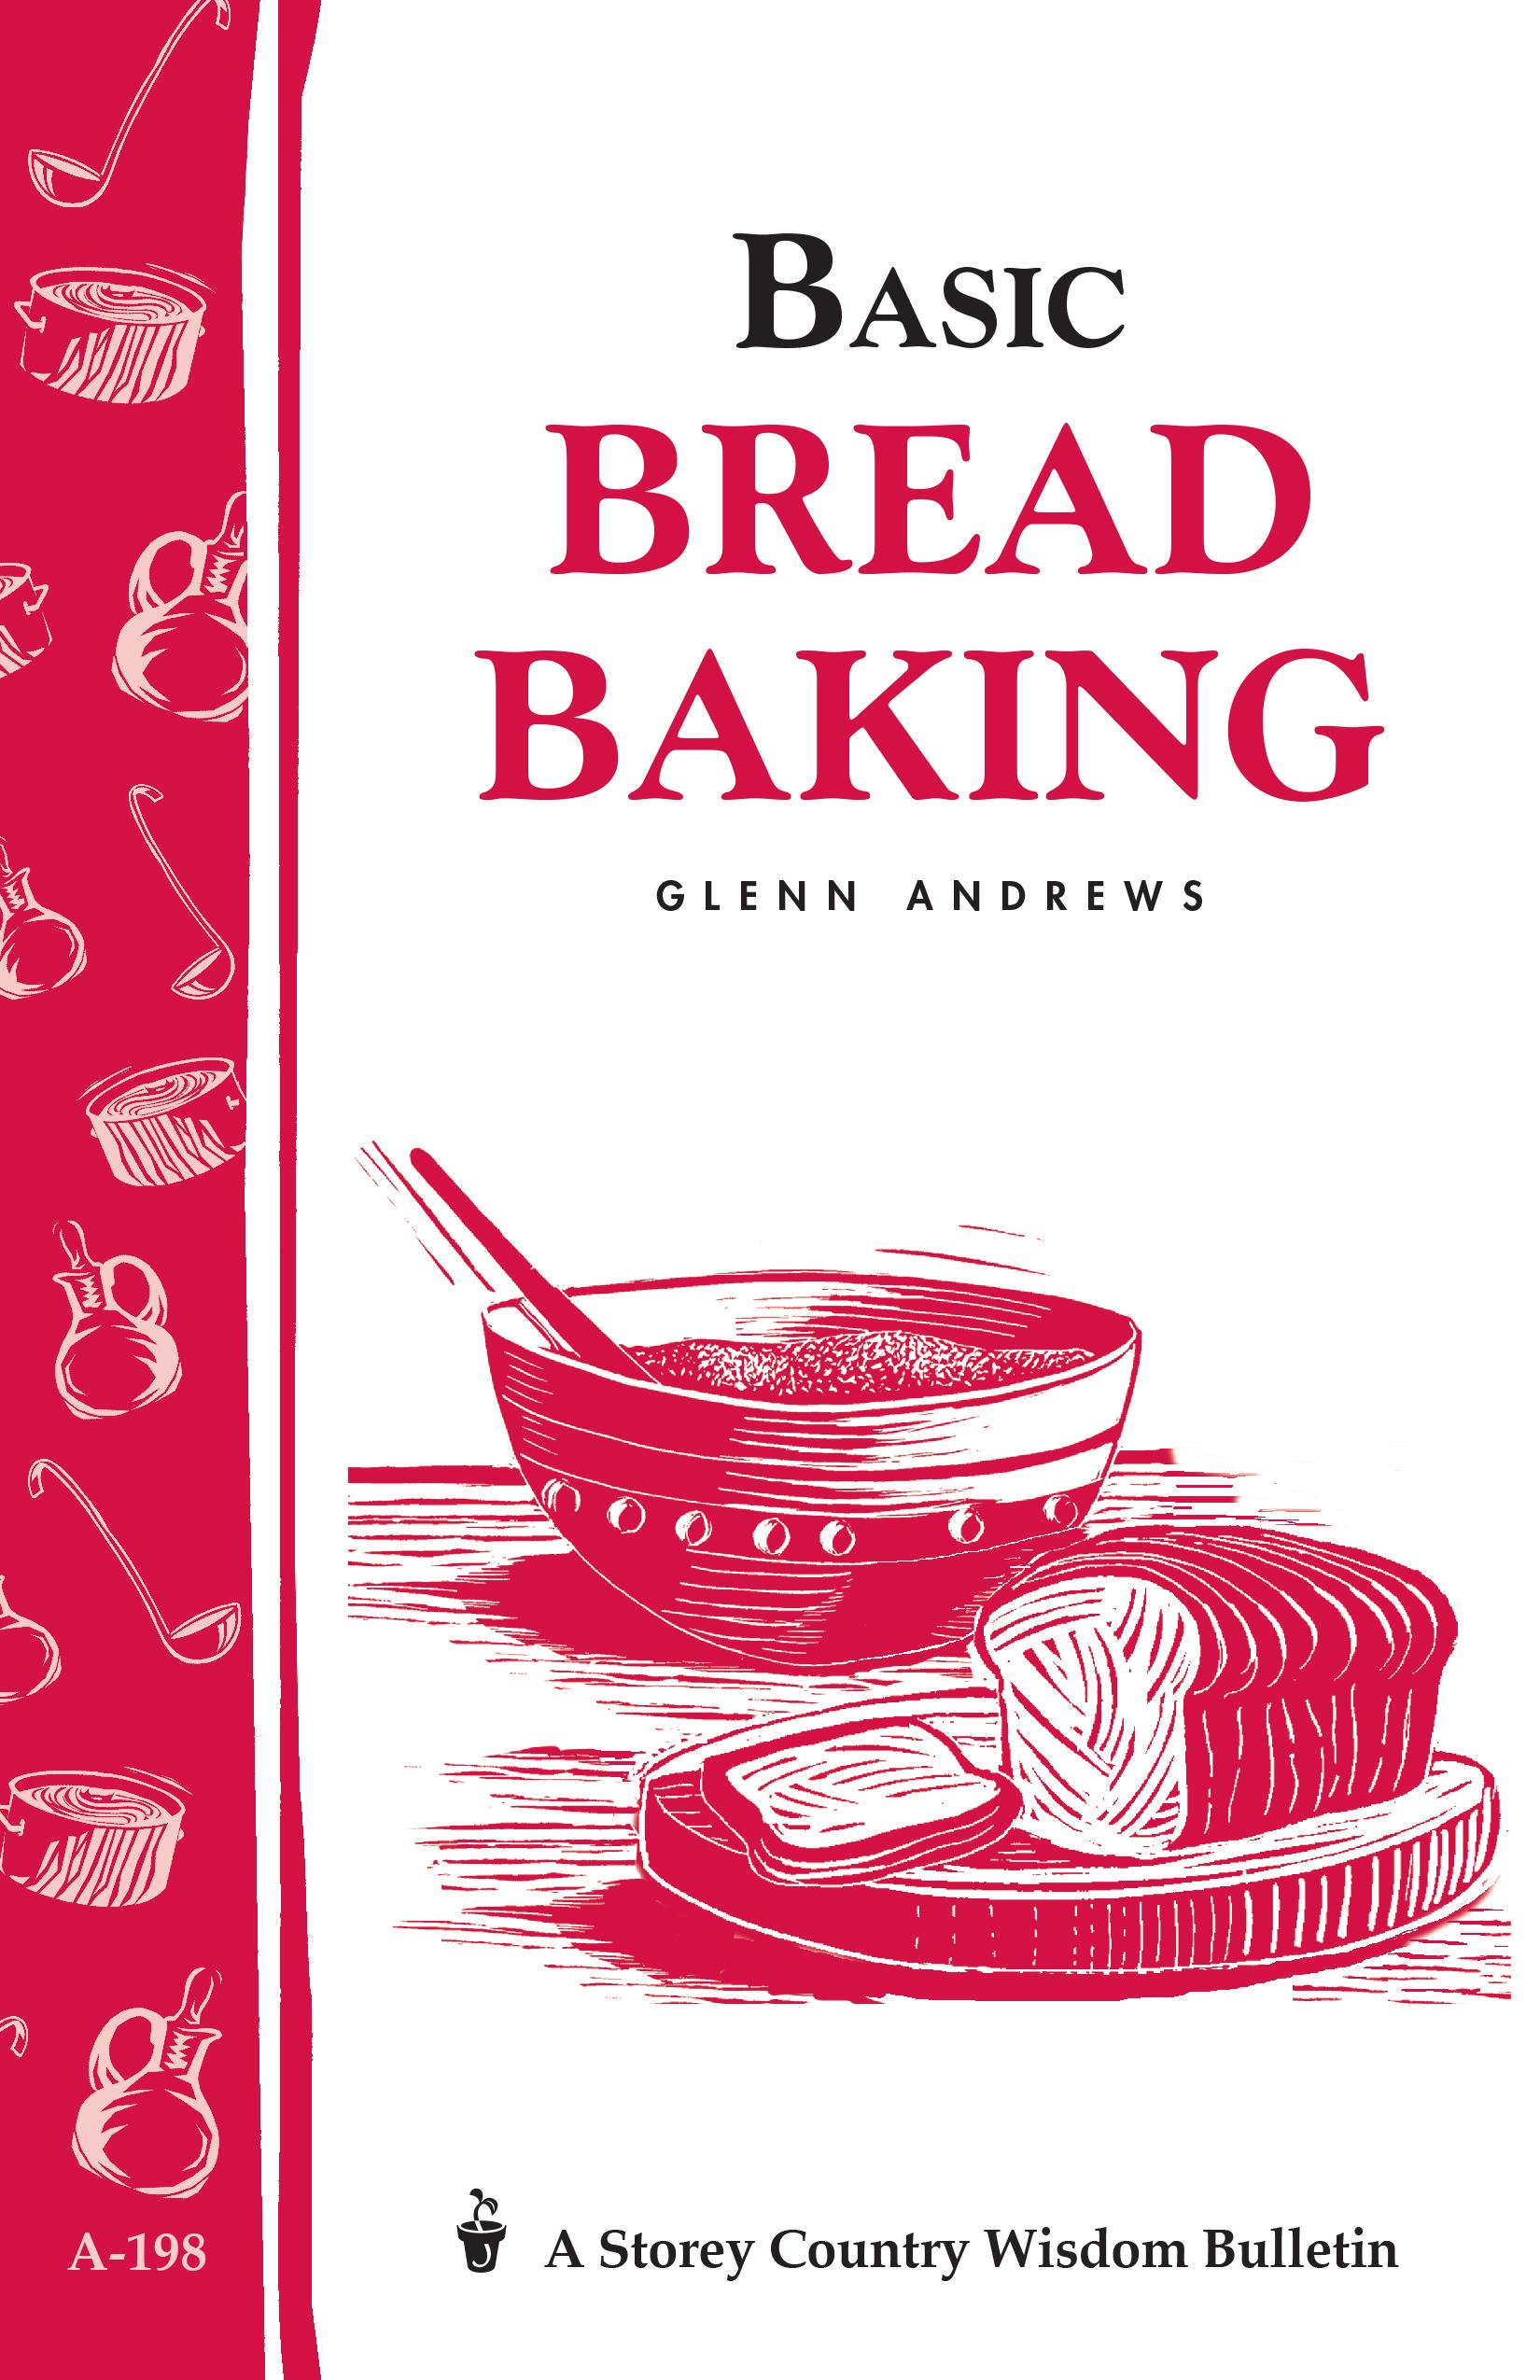 Basic Bread Baking Storey's Country Wisdom Bulletin A-198 - Glenn Andrews